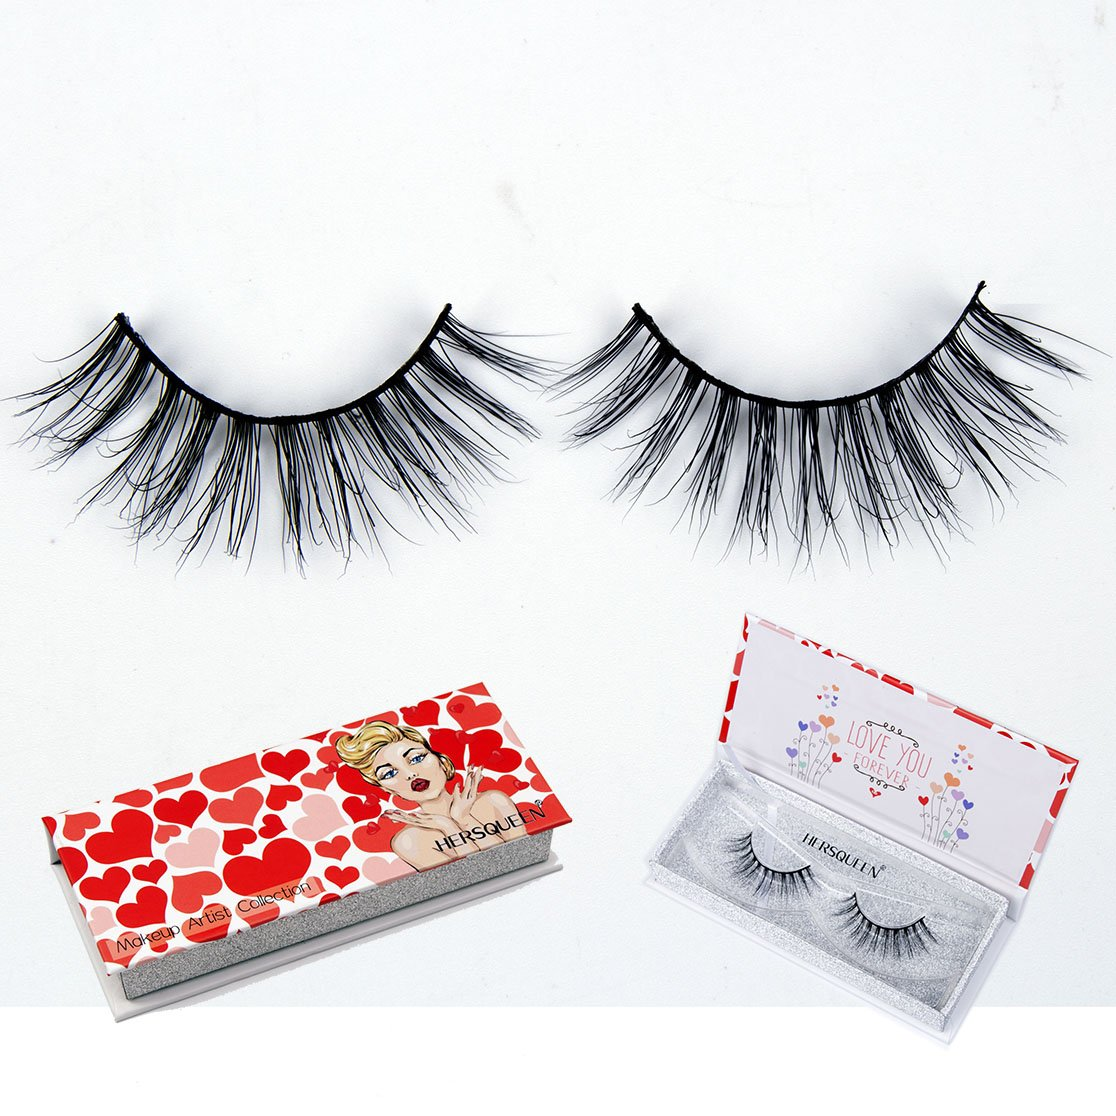 16e0776d1bd High End Makeup 3D Mink Lashes 100% Cruelty-Free Siberian Mink Fur Fake  Lashes Fully Handmade False Eyelashes Natural Eyelash or Dramatic Lashes  Both ...